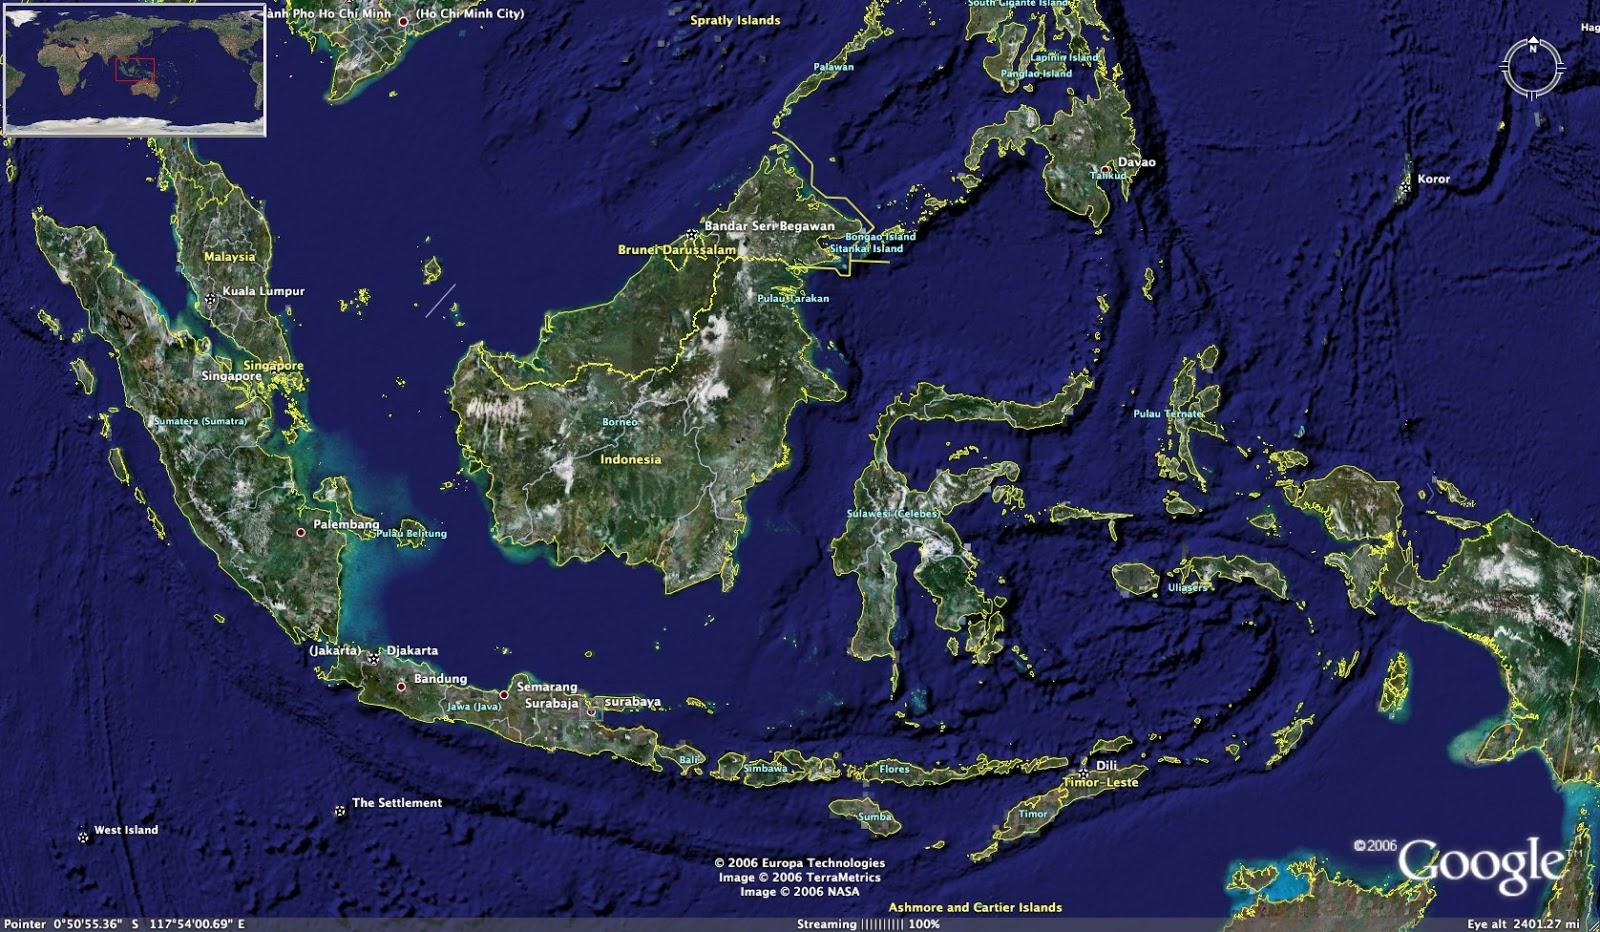 Jumlah pulau du negara indonesia